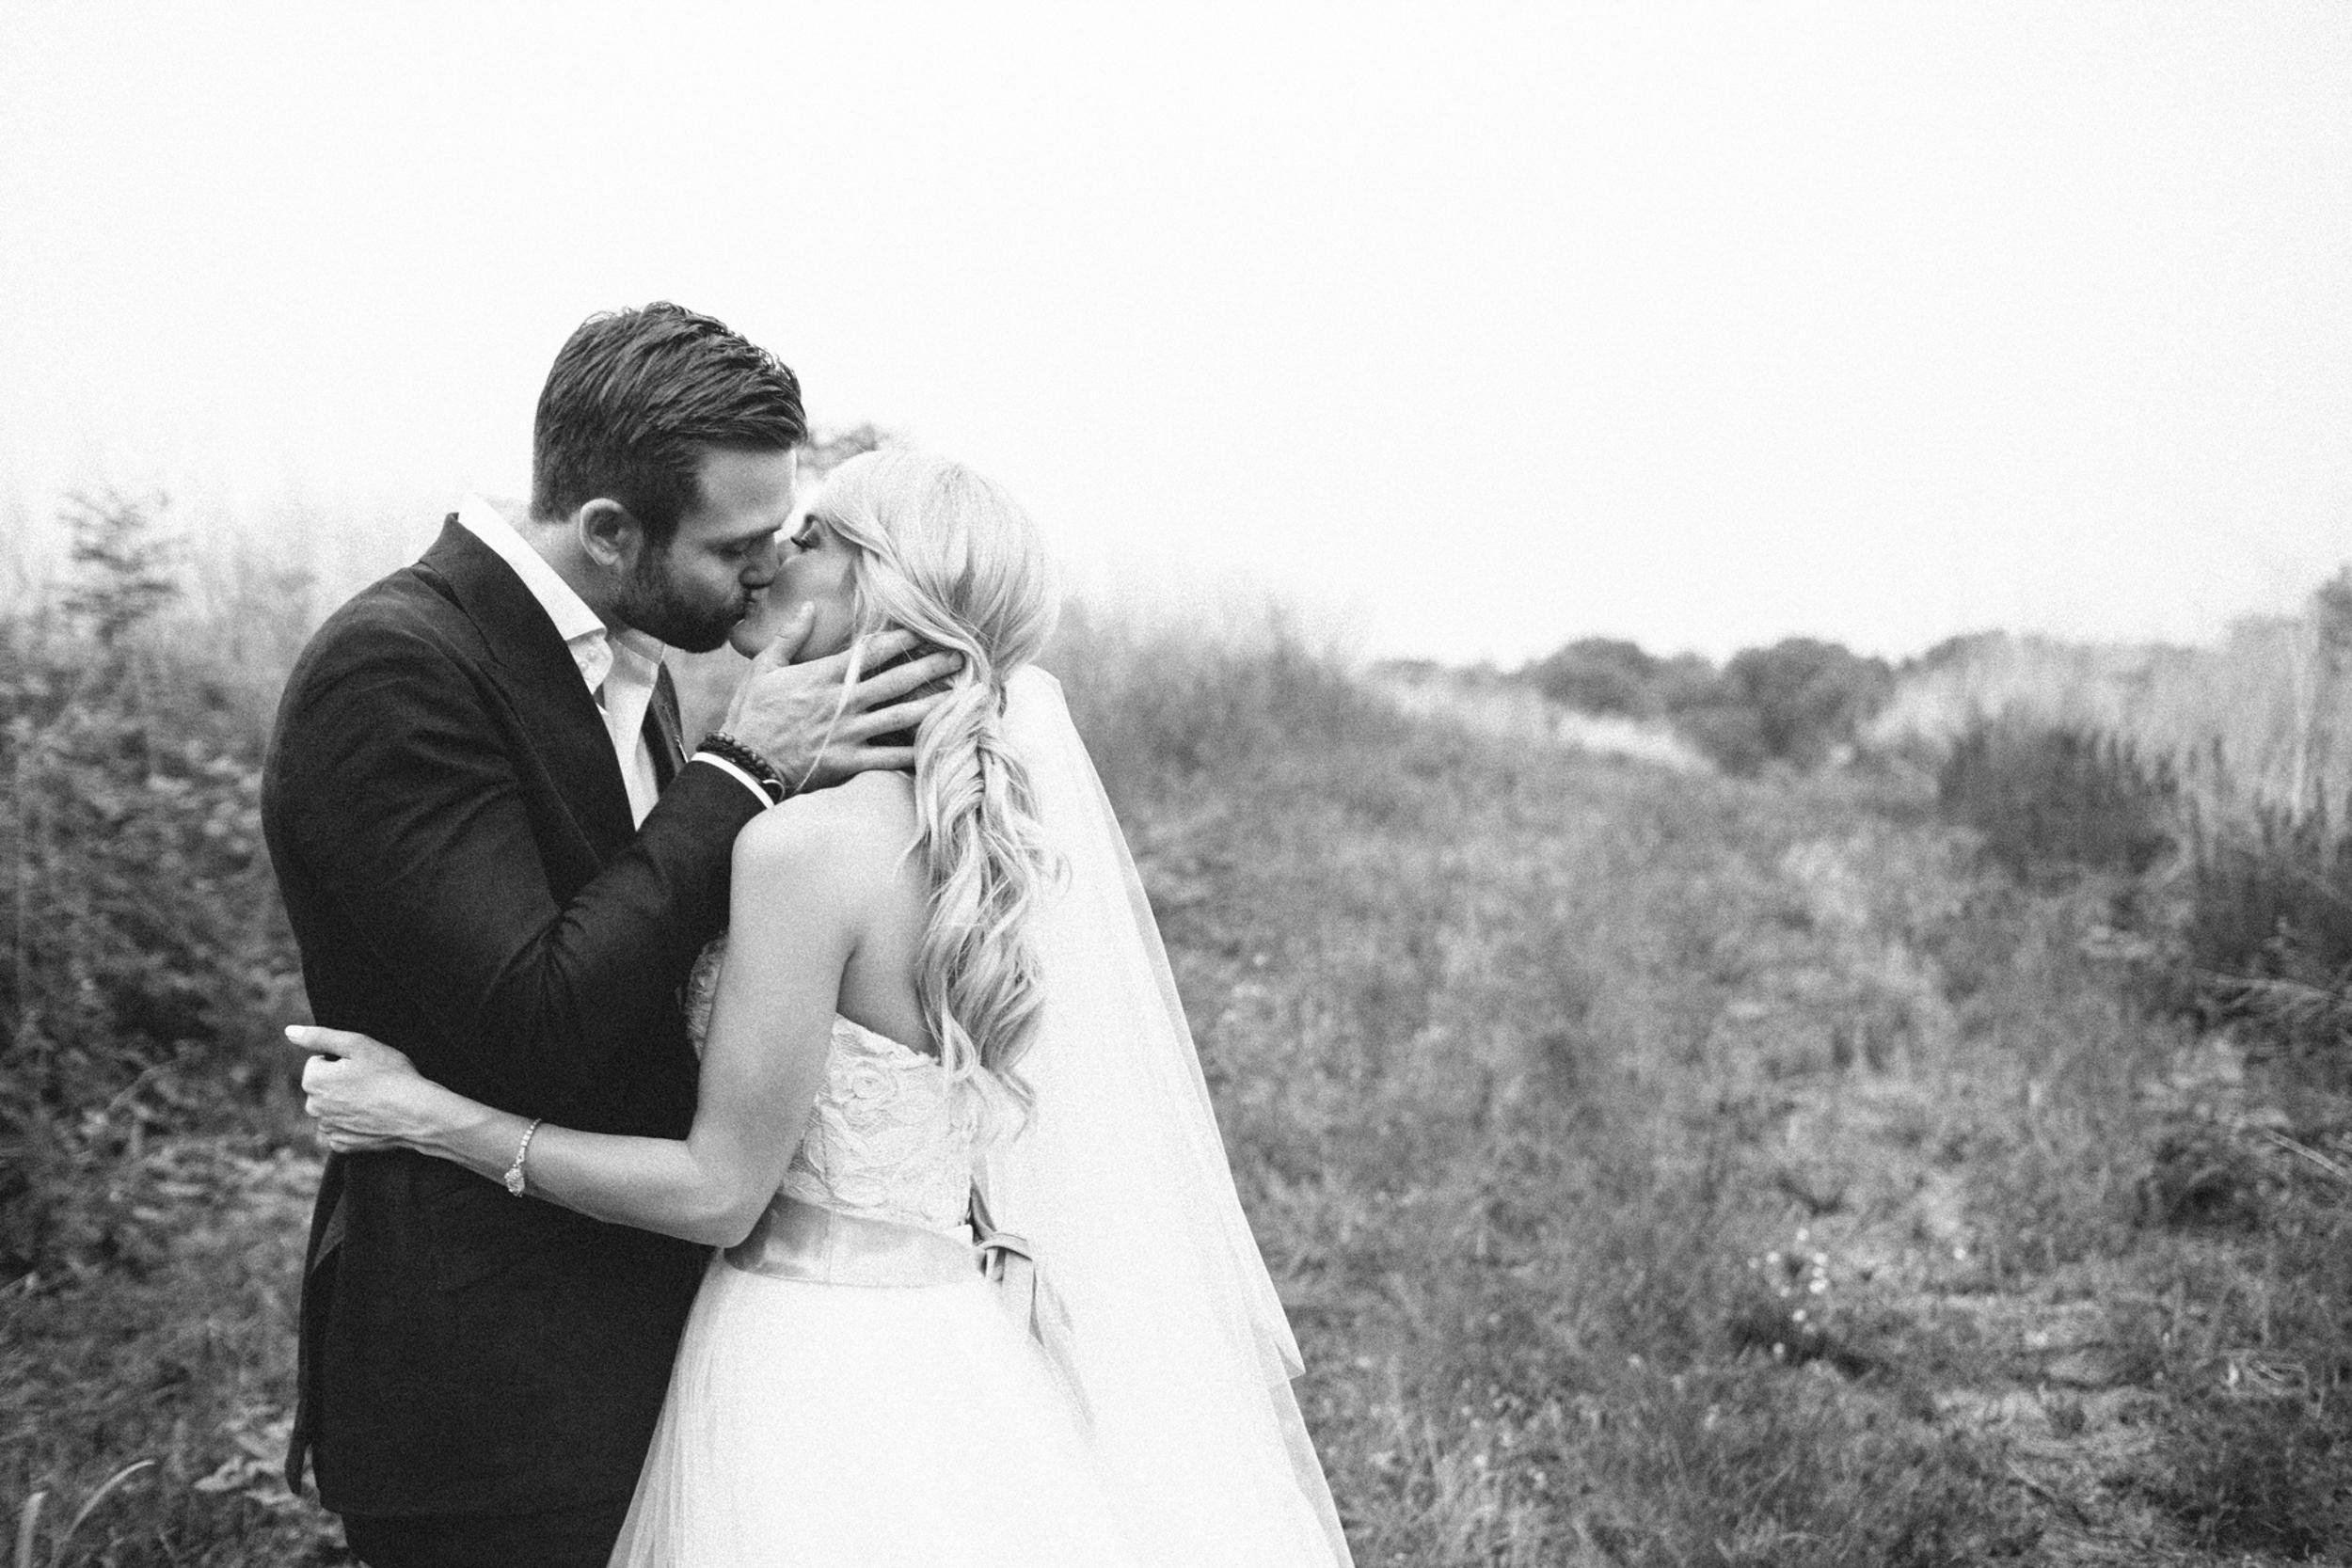 south_carolina_farm_wedding_rustic_chic_surprise_secret_luxe_wedding_bachelorette_emily_maynard_real_weddings-15.jpg